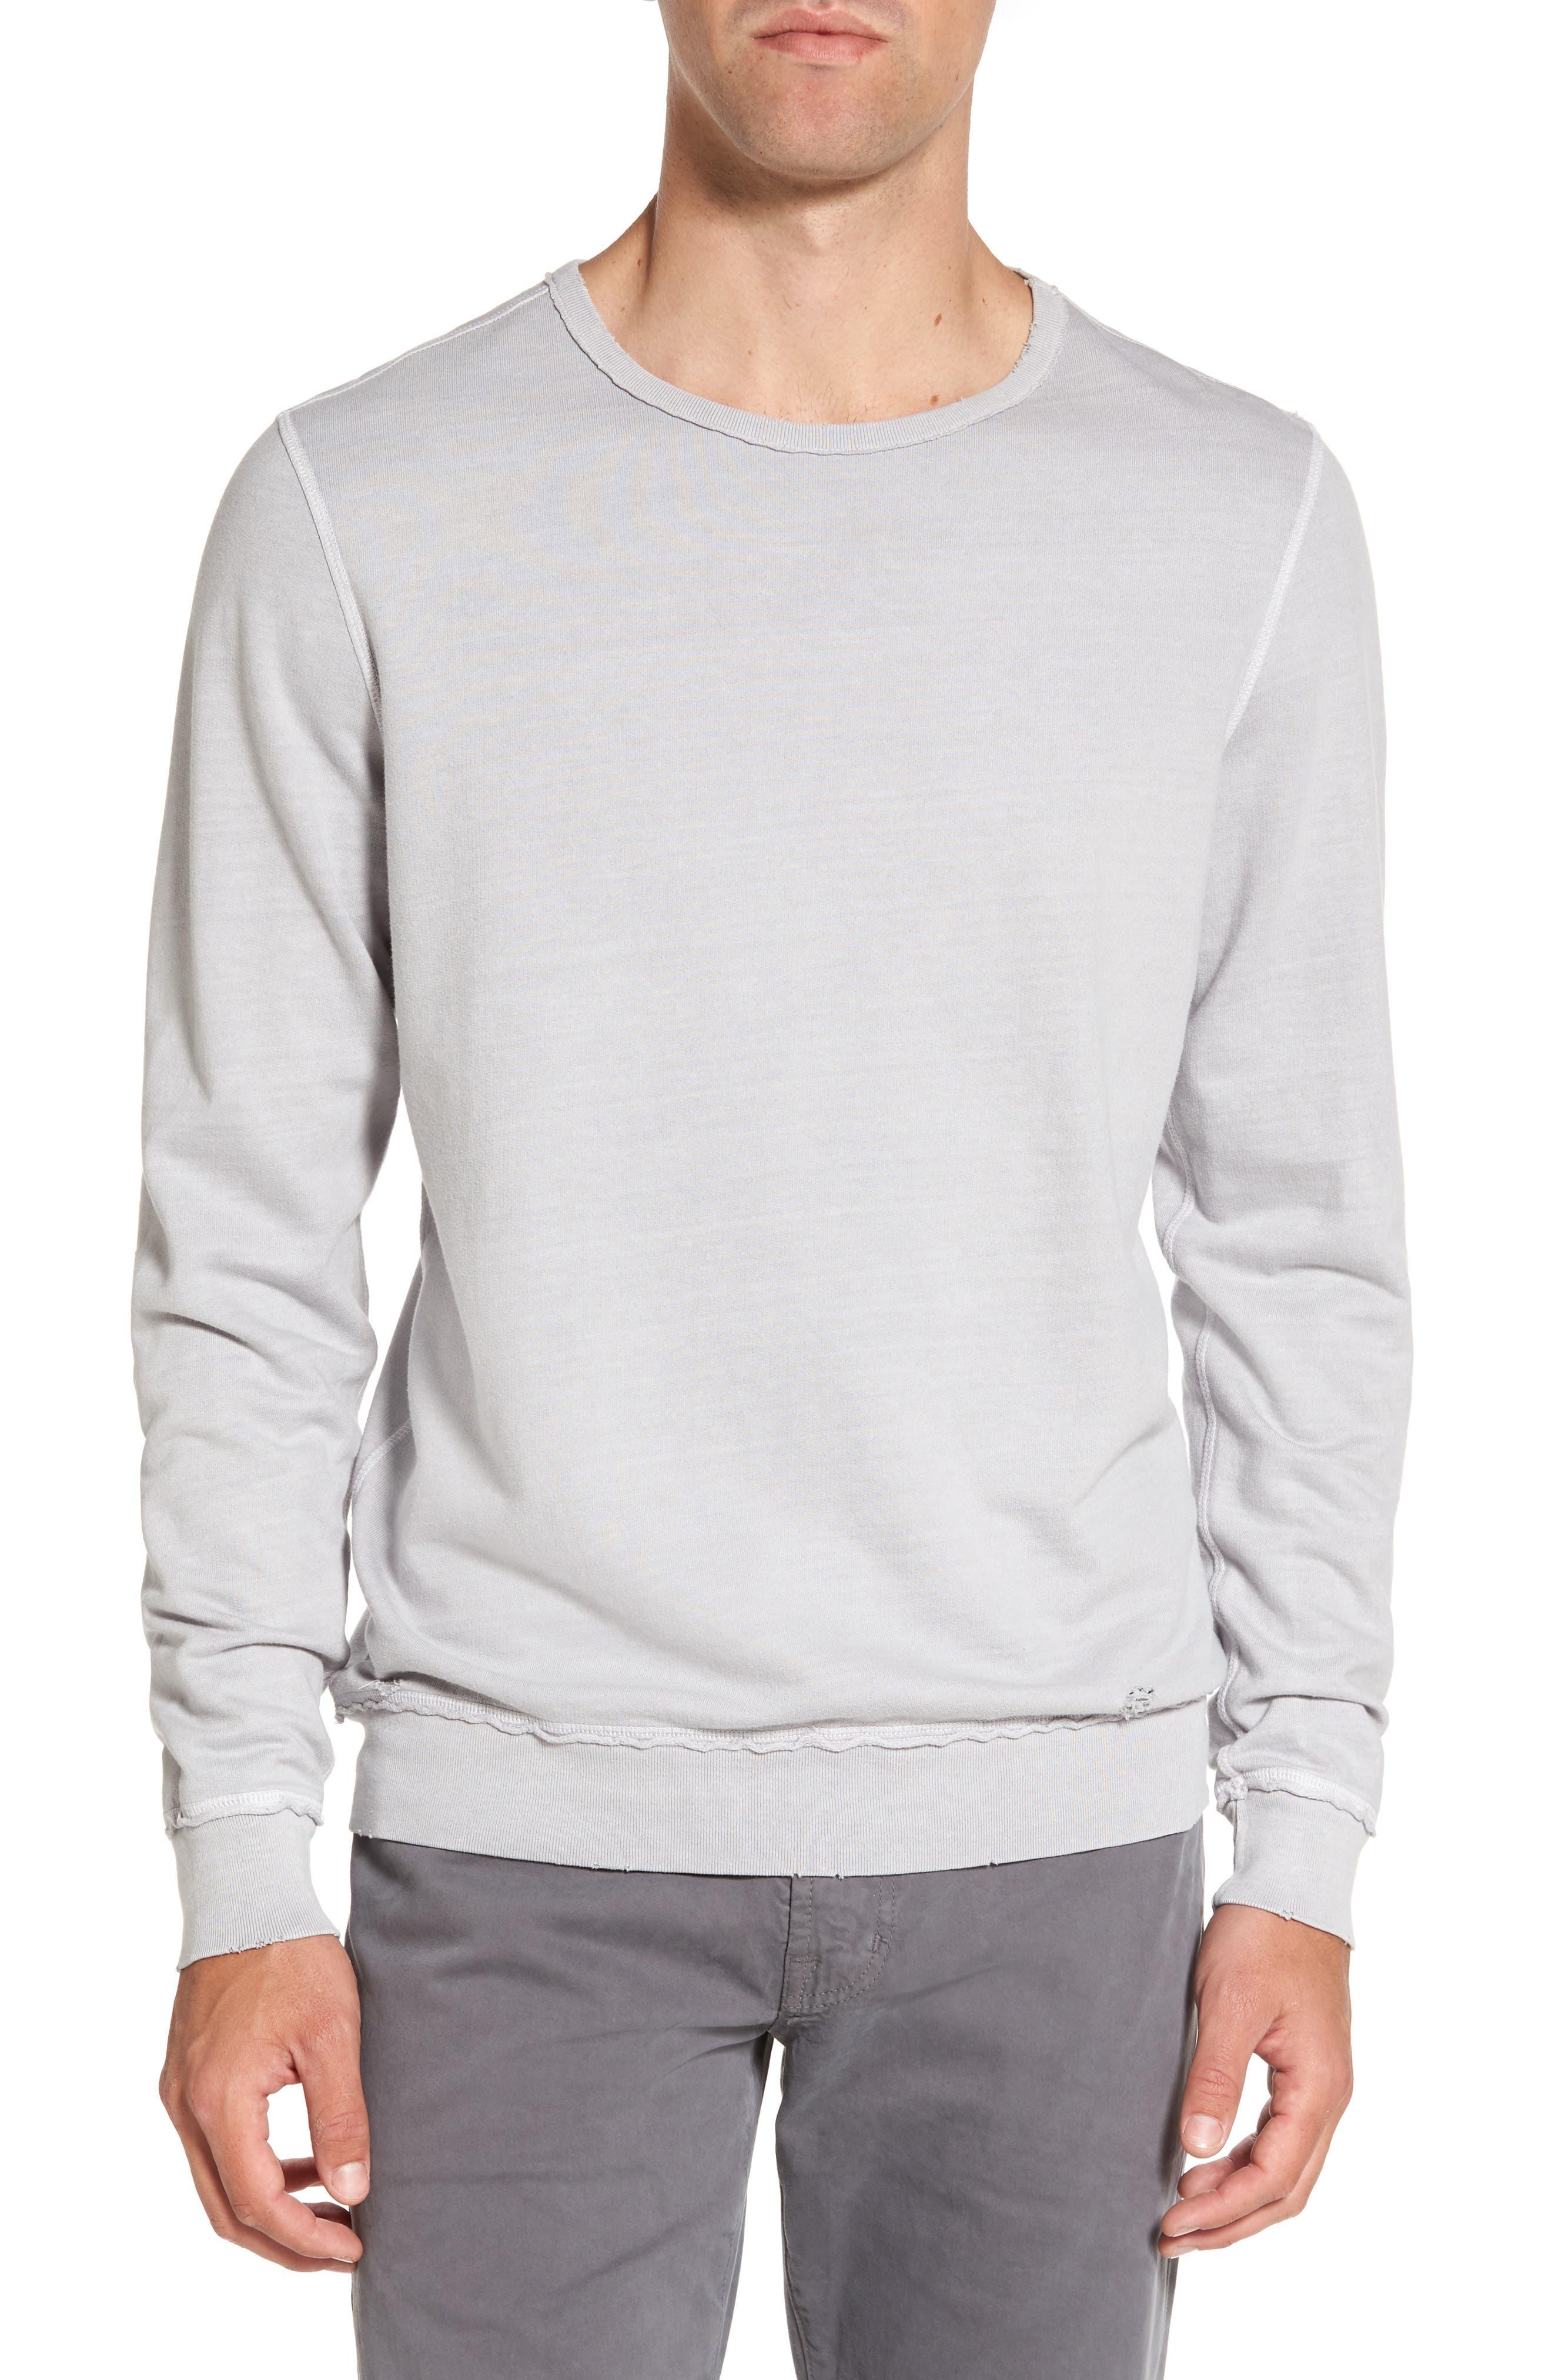 Main Image - AG Brendan Raw Edge Crewneck Sweatshirt